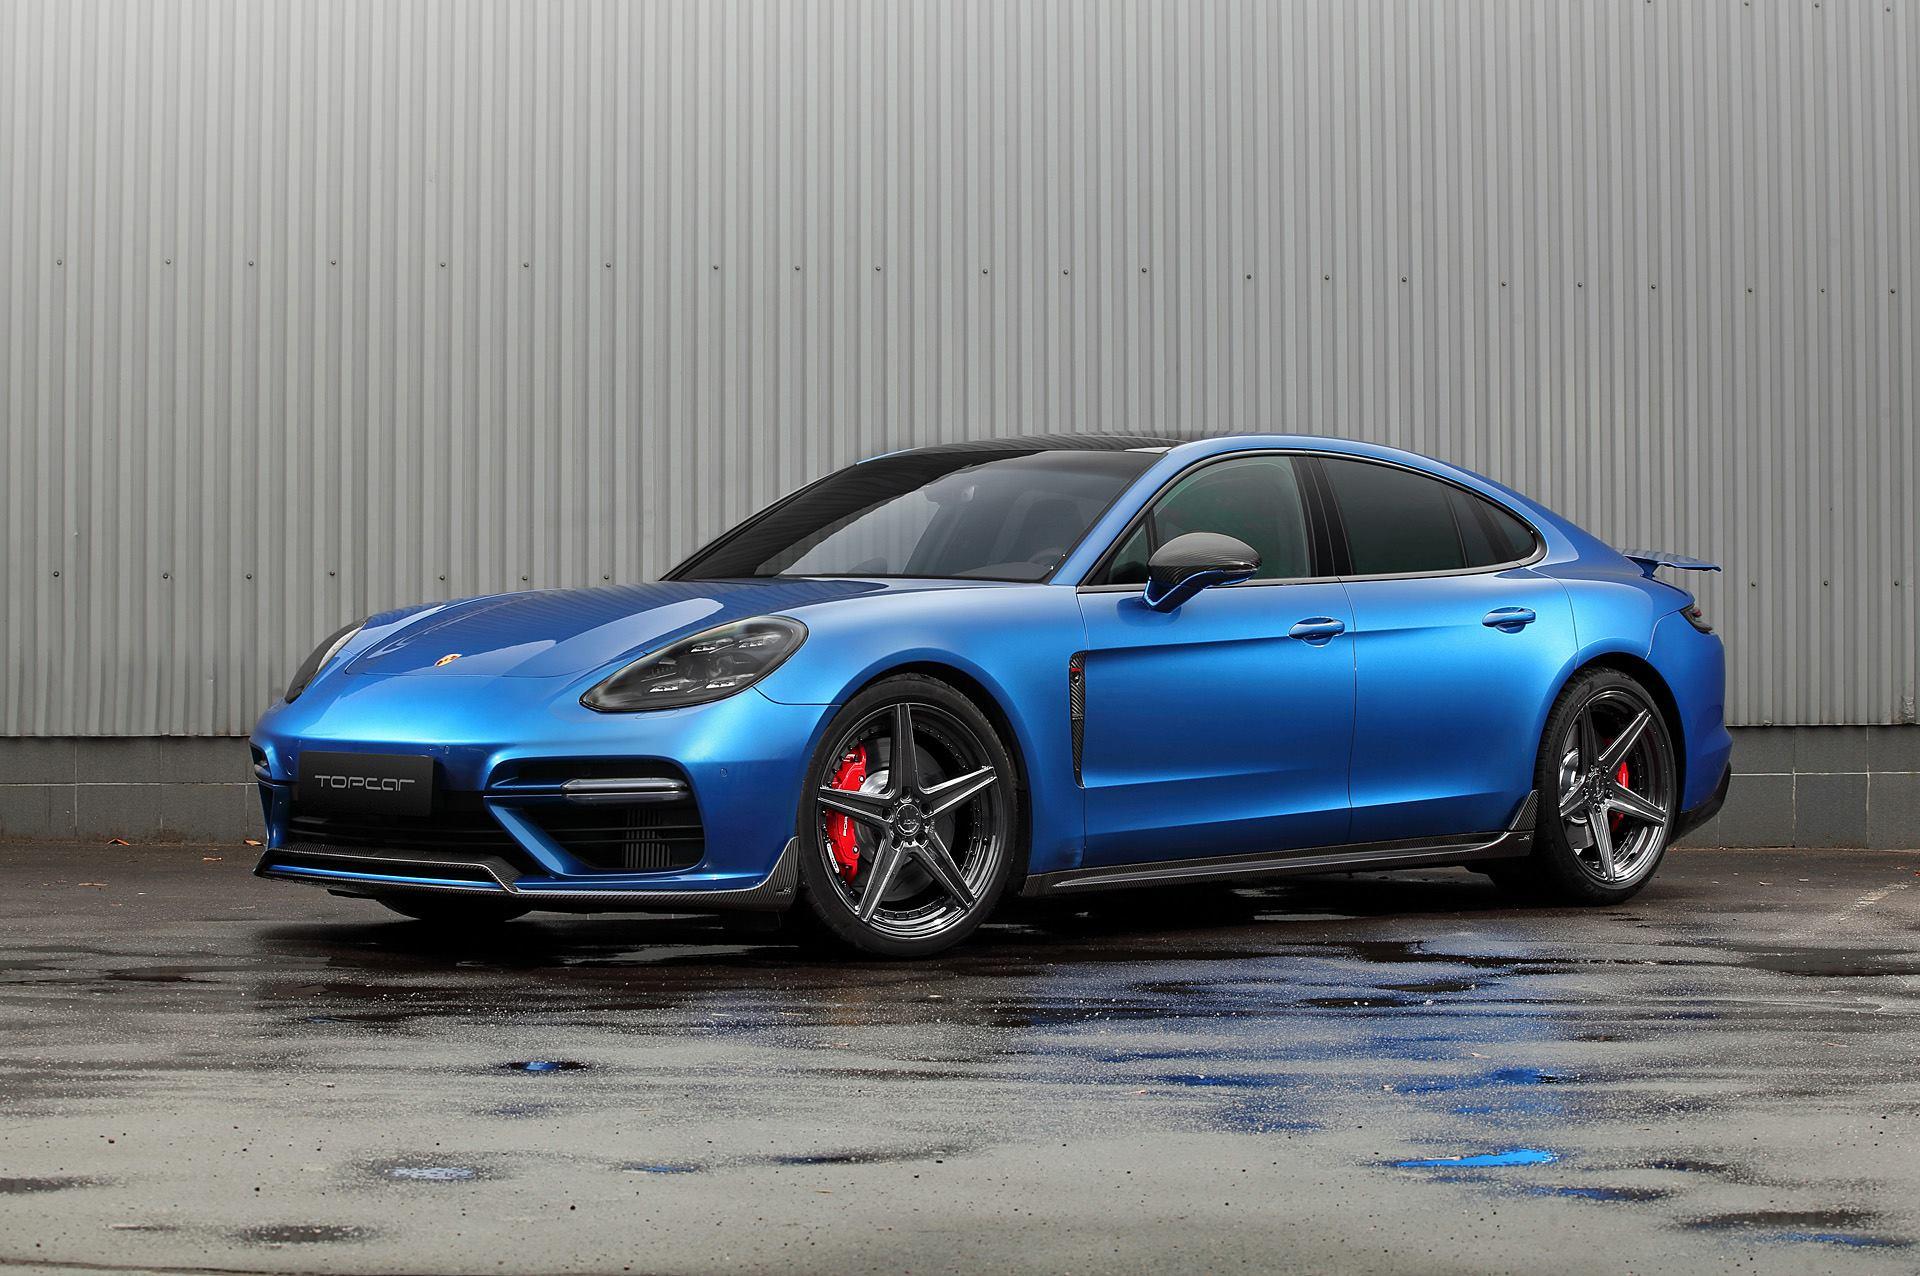 Porsche_Panamera_by_TopCar_GT_Edition_0002